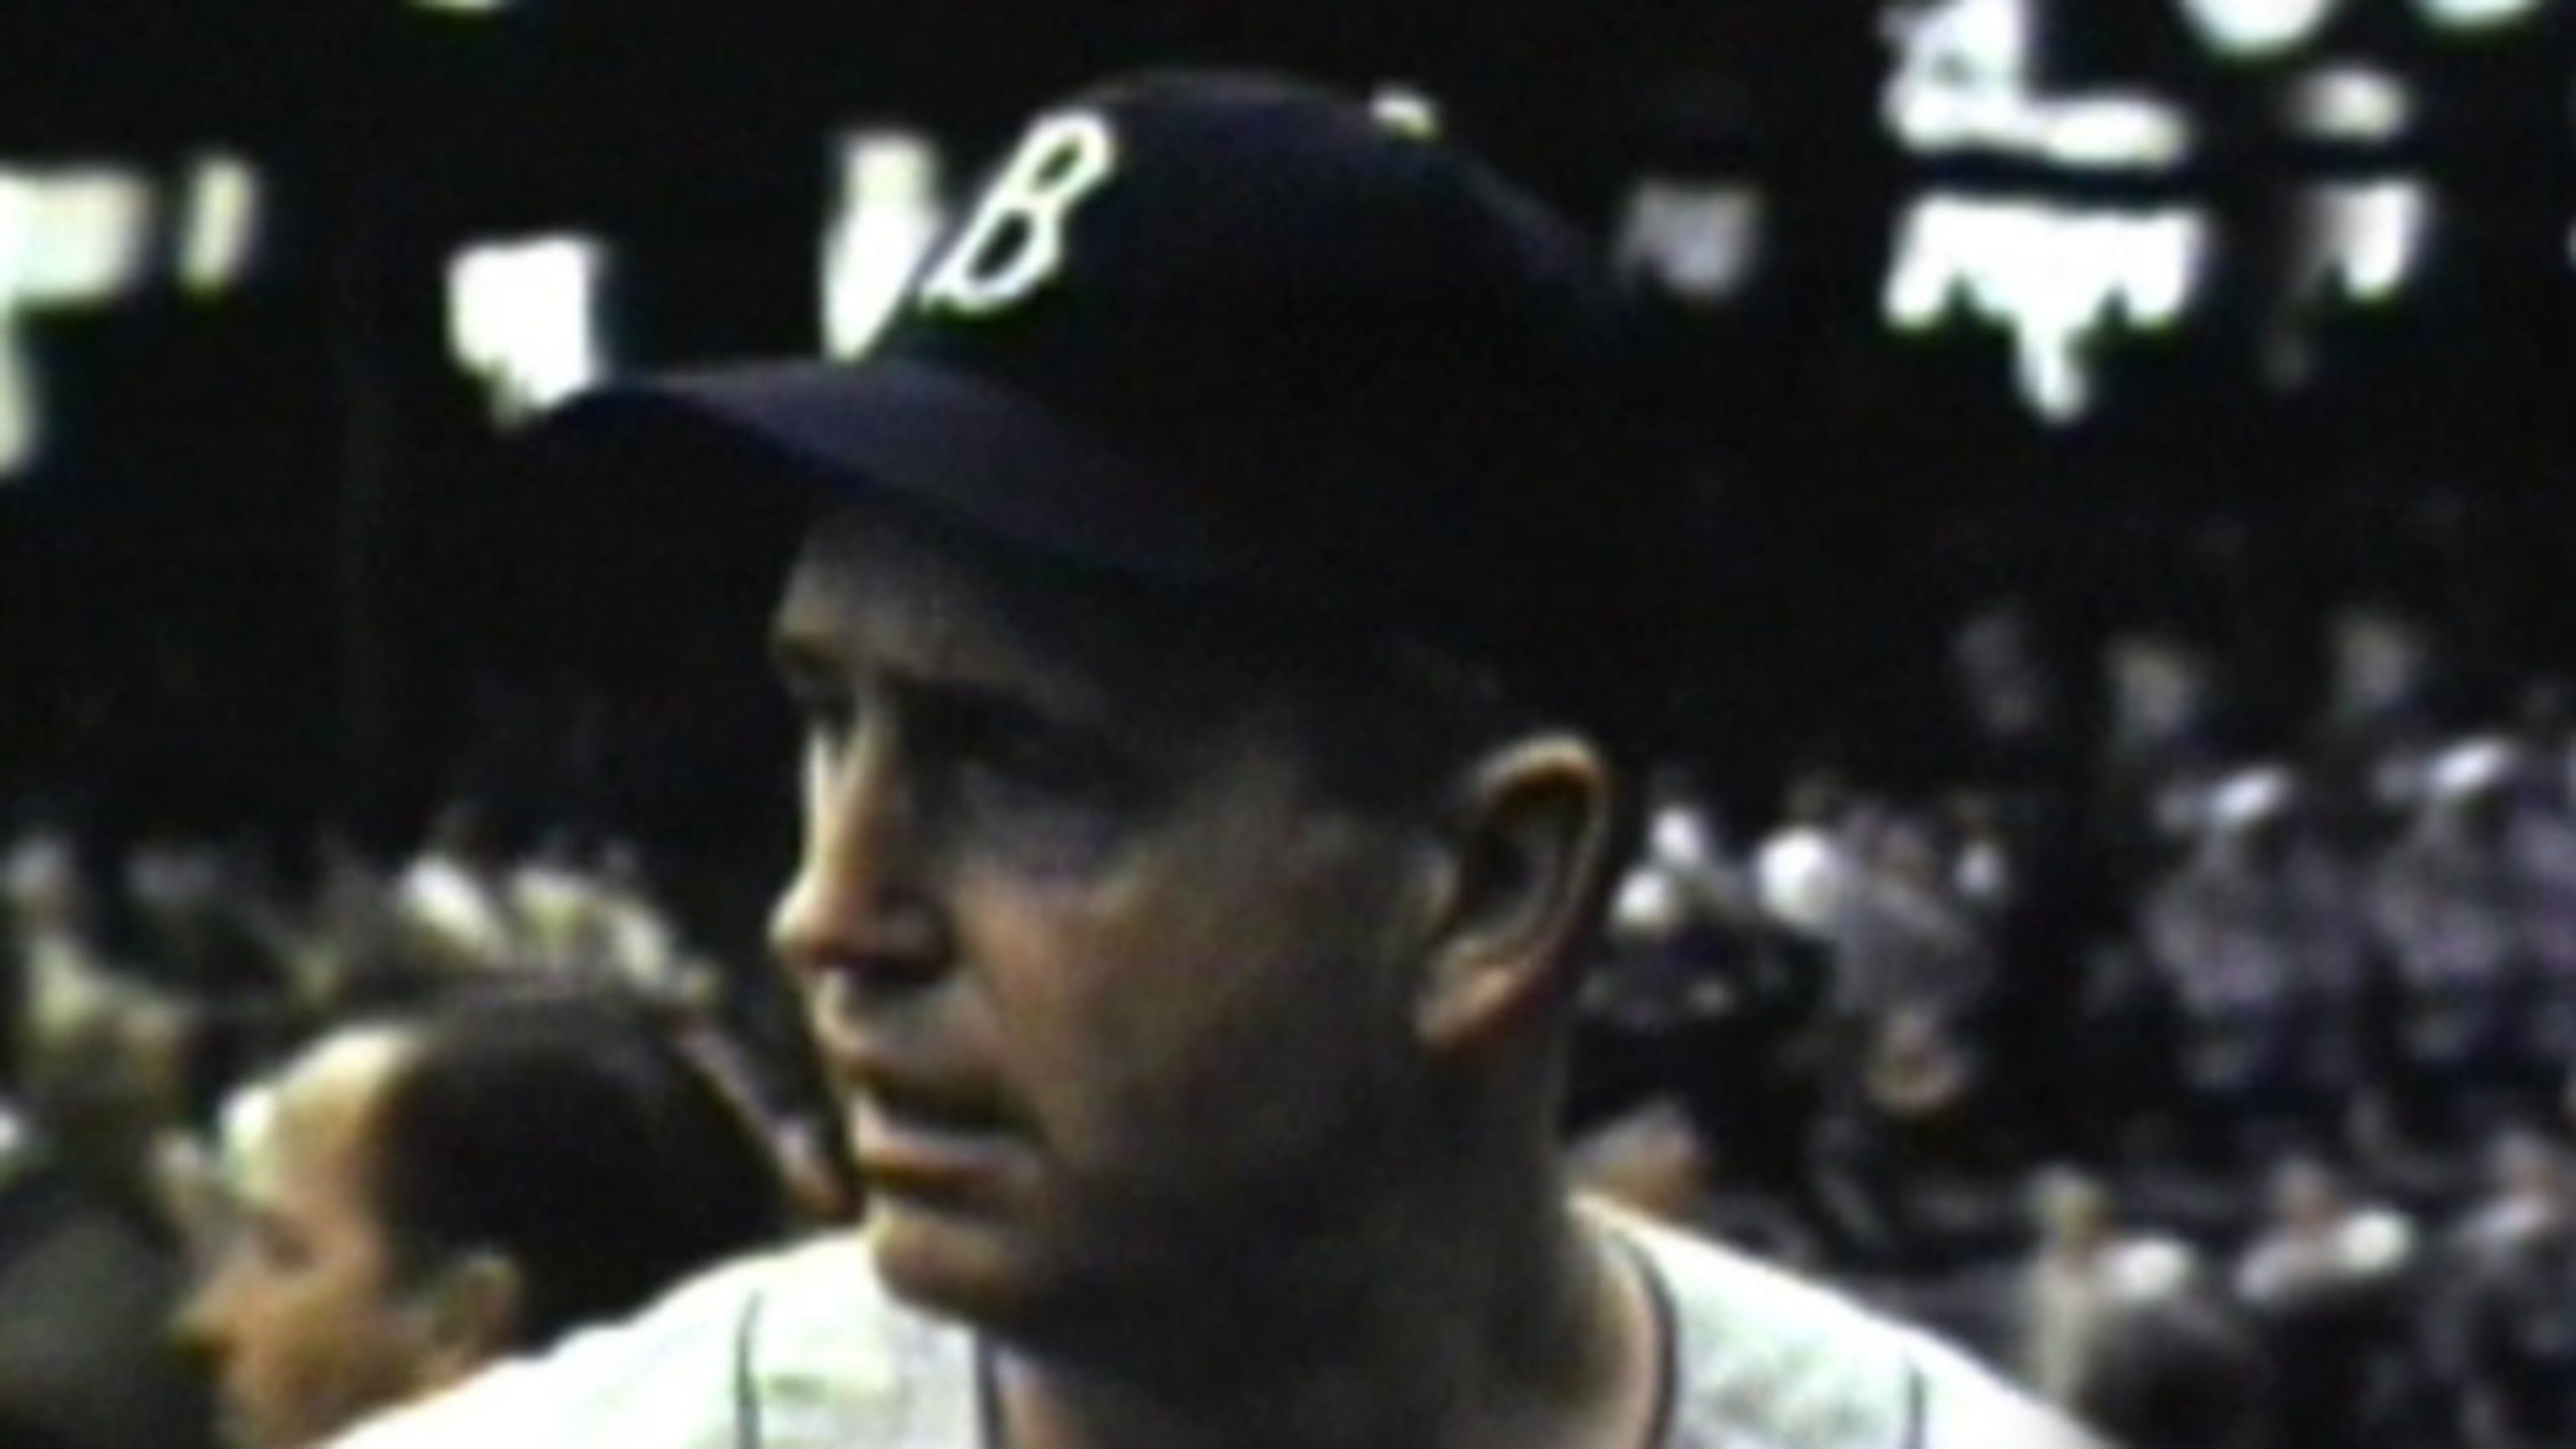 Dodgers: Walter Alston, No. 24